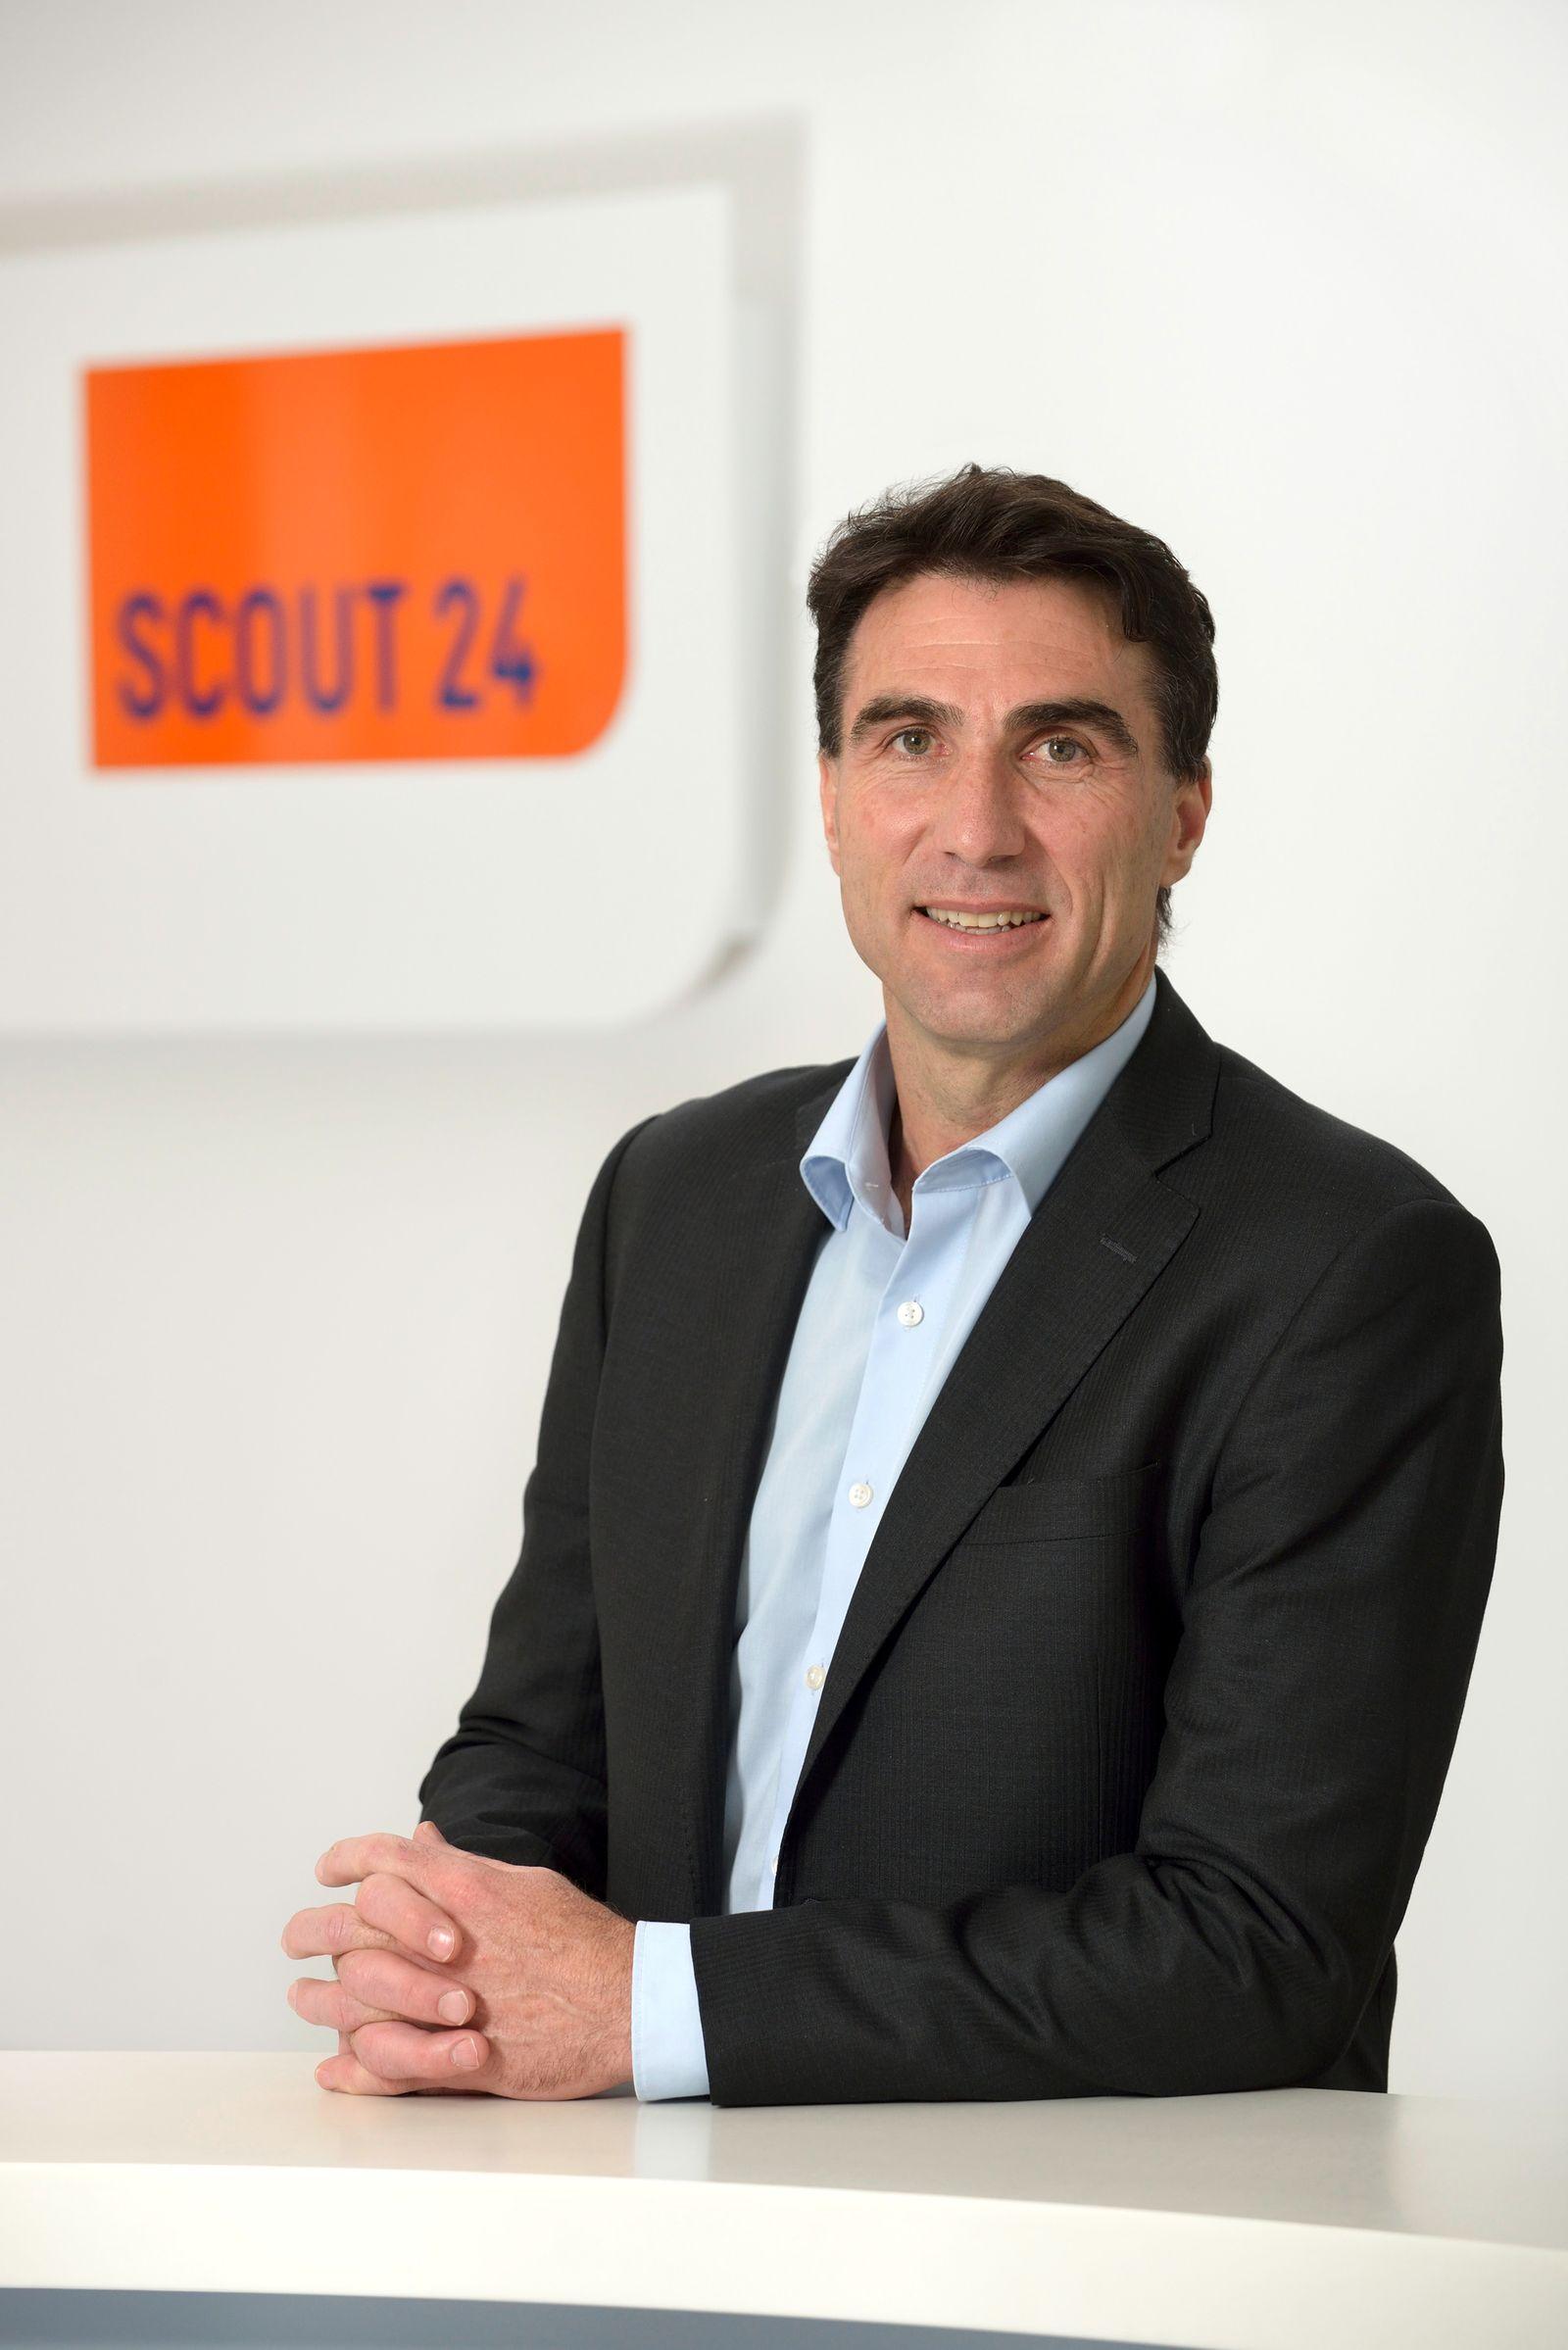 Greg Ellis; Scout 24